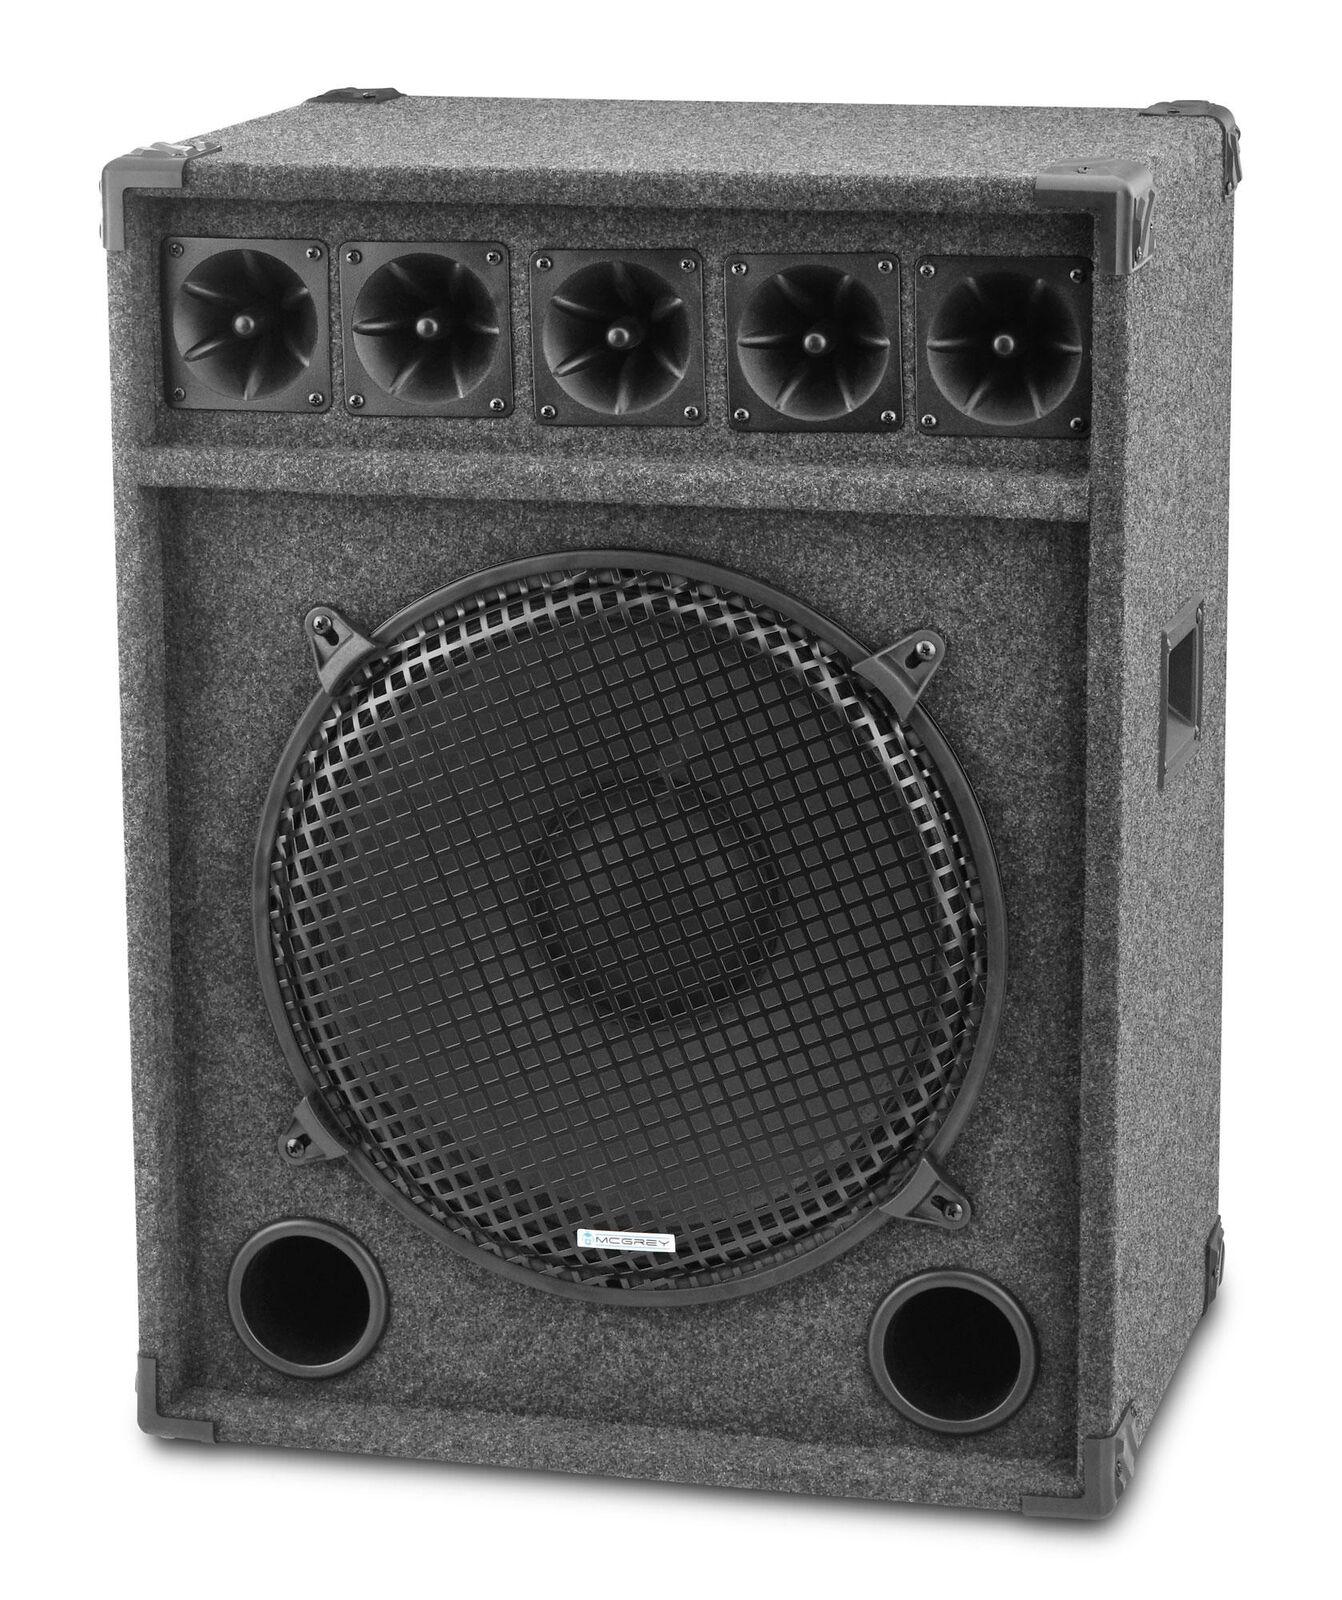 15  (38cm) DJ PA altavoces club club club Bass subwoofer fiesta box speaker 600 vatios  tiempo libre